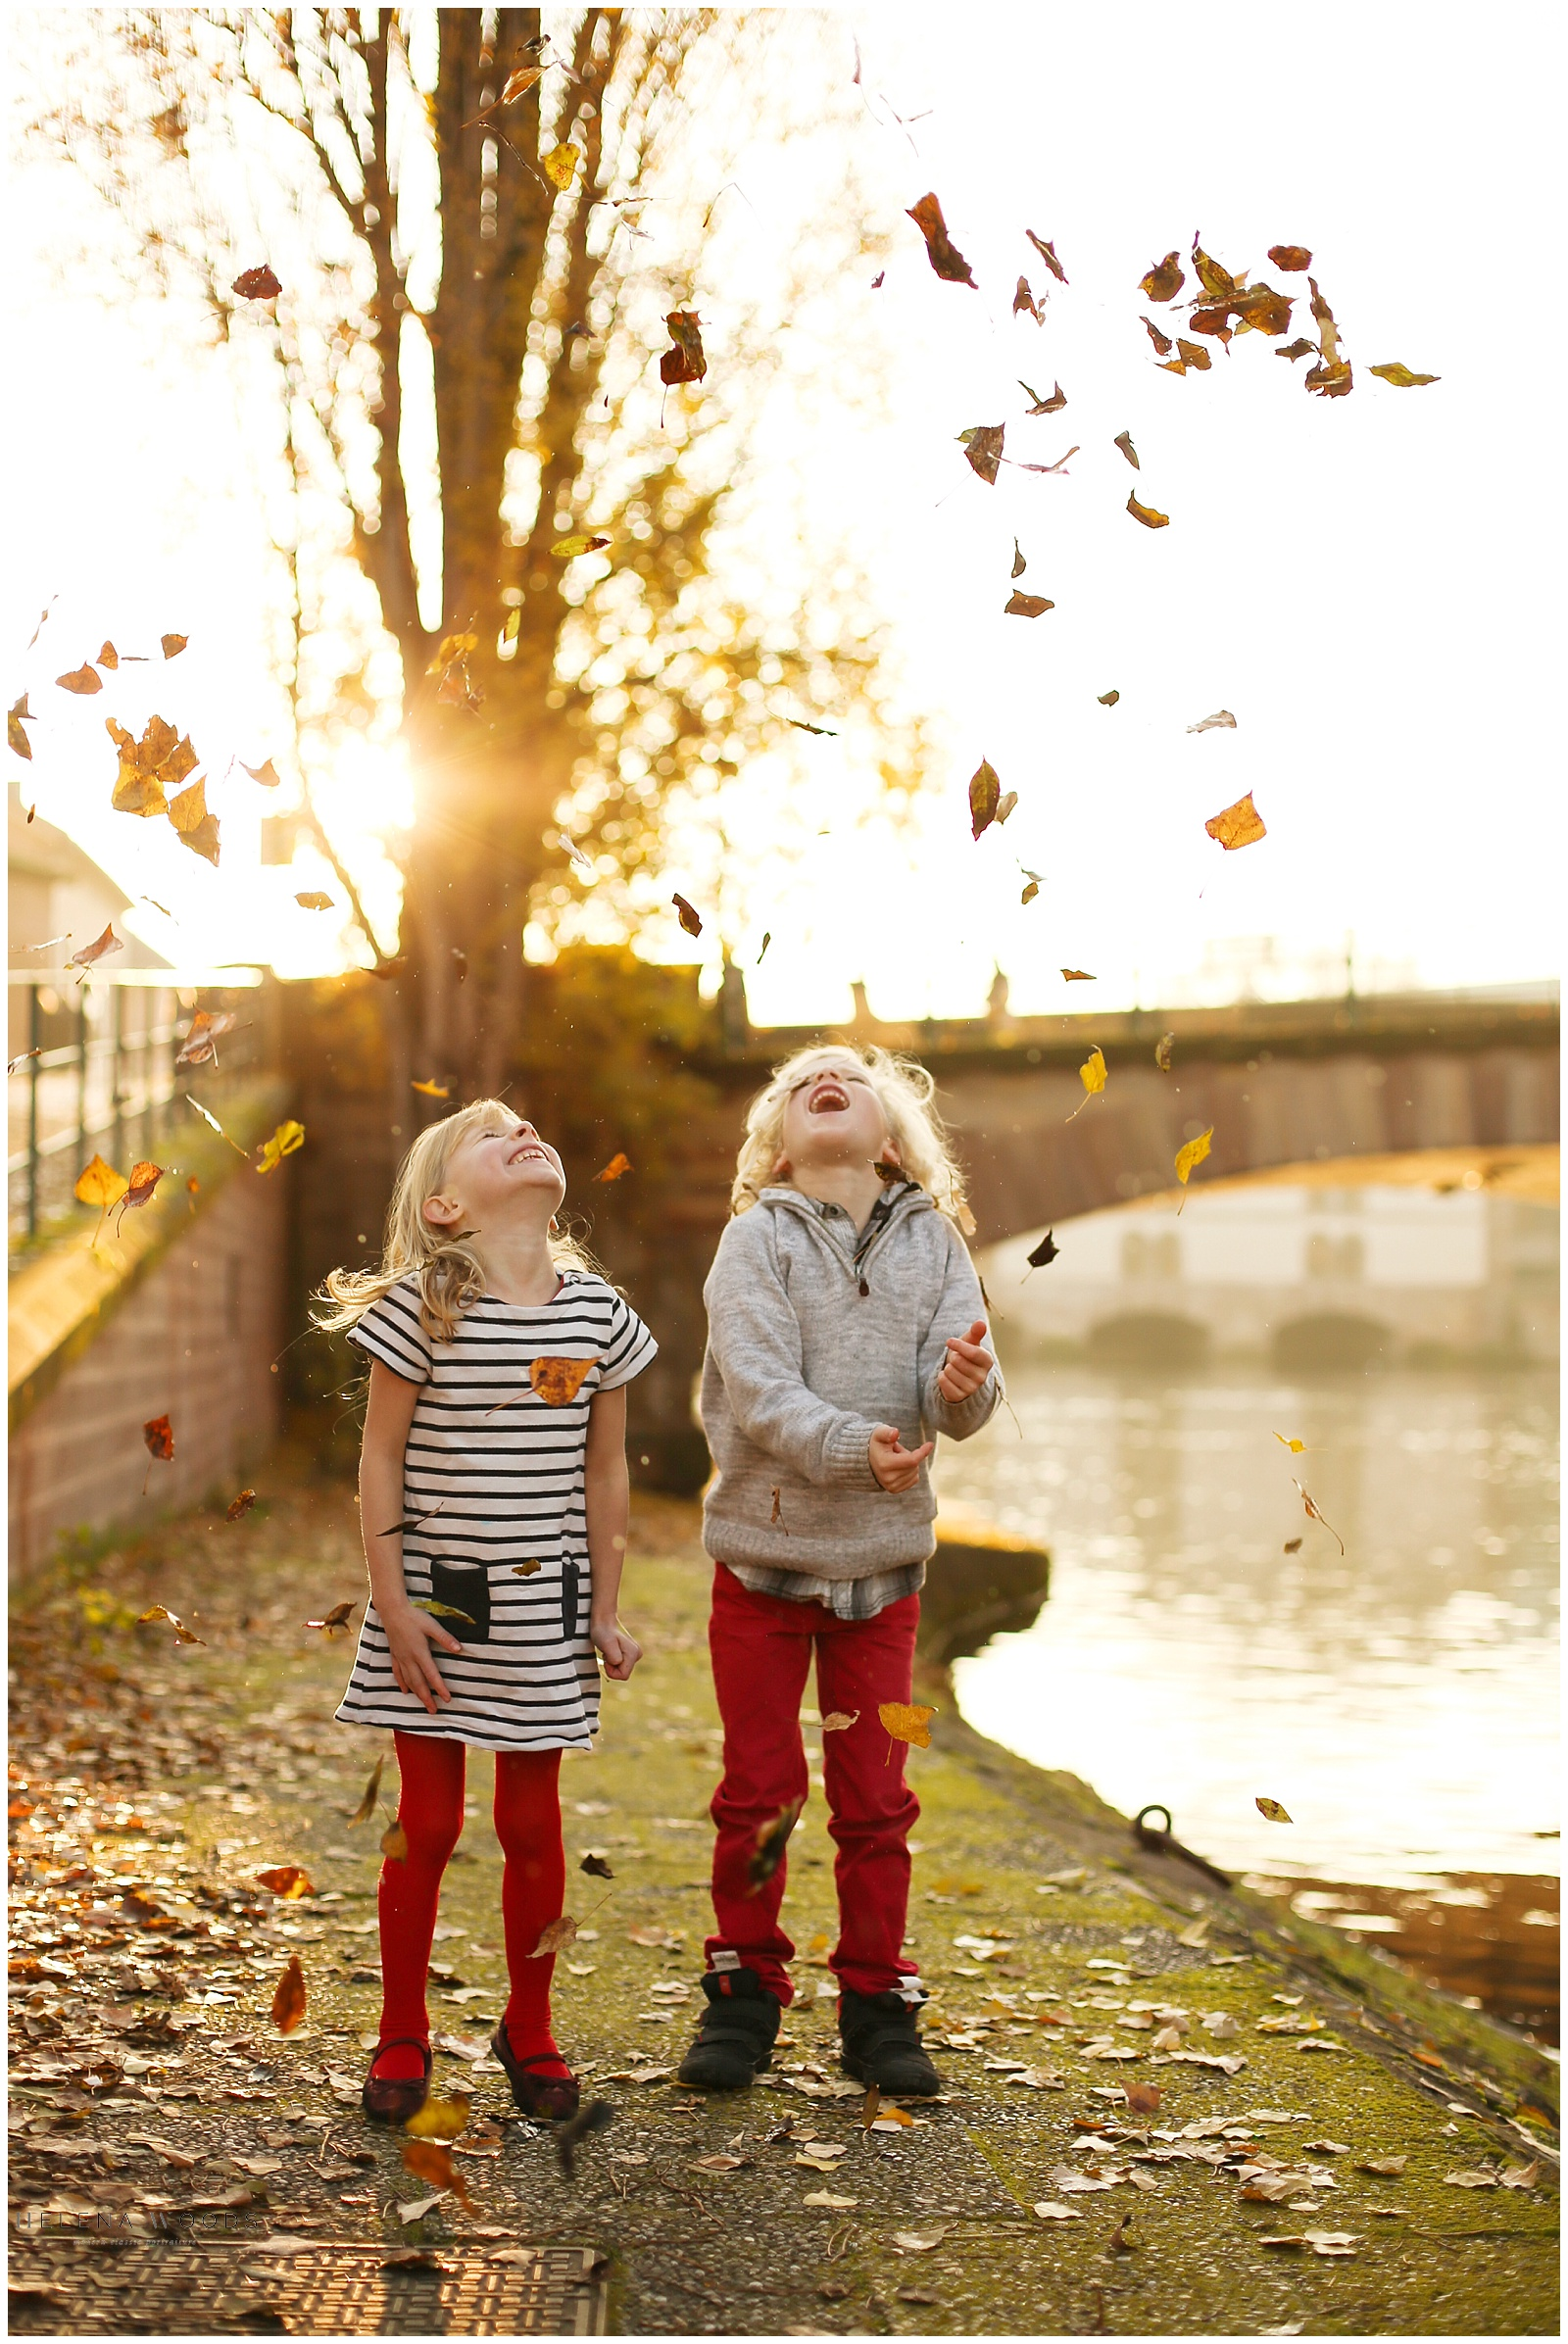 kids throwing leaves in Petite France Strasbourg France